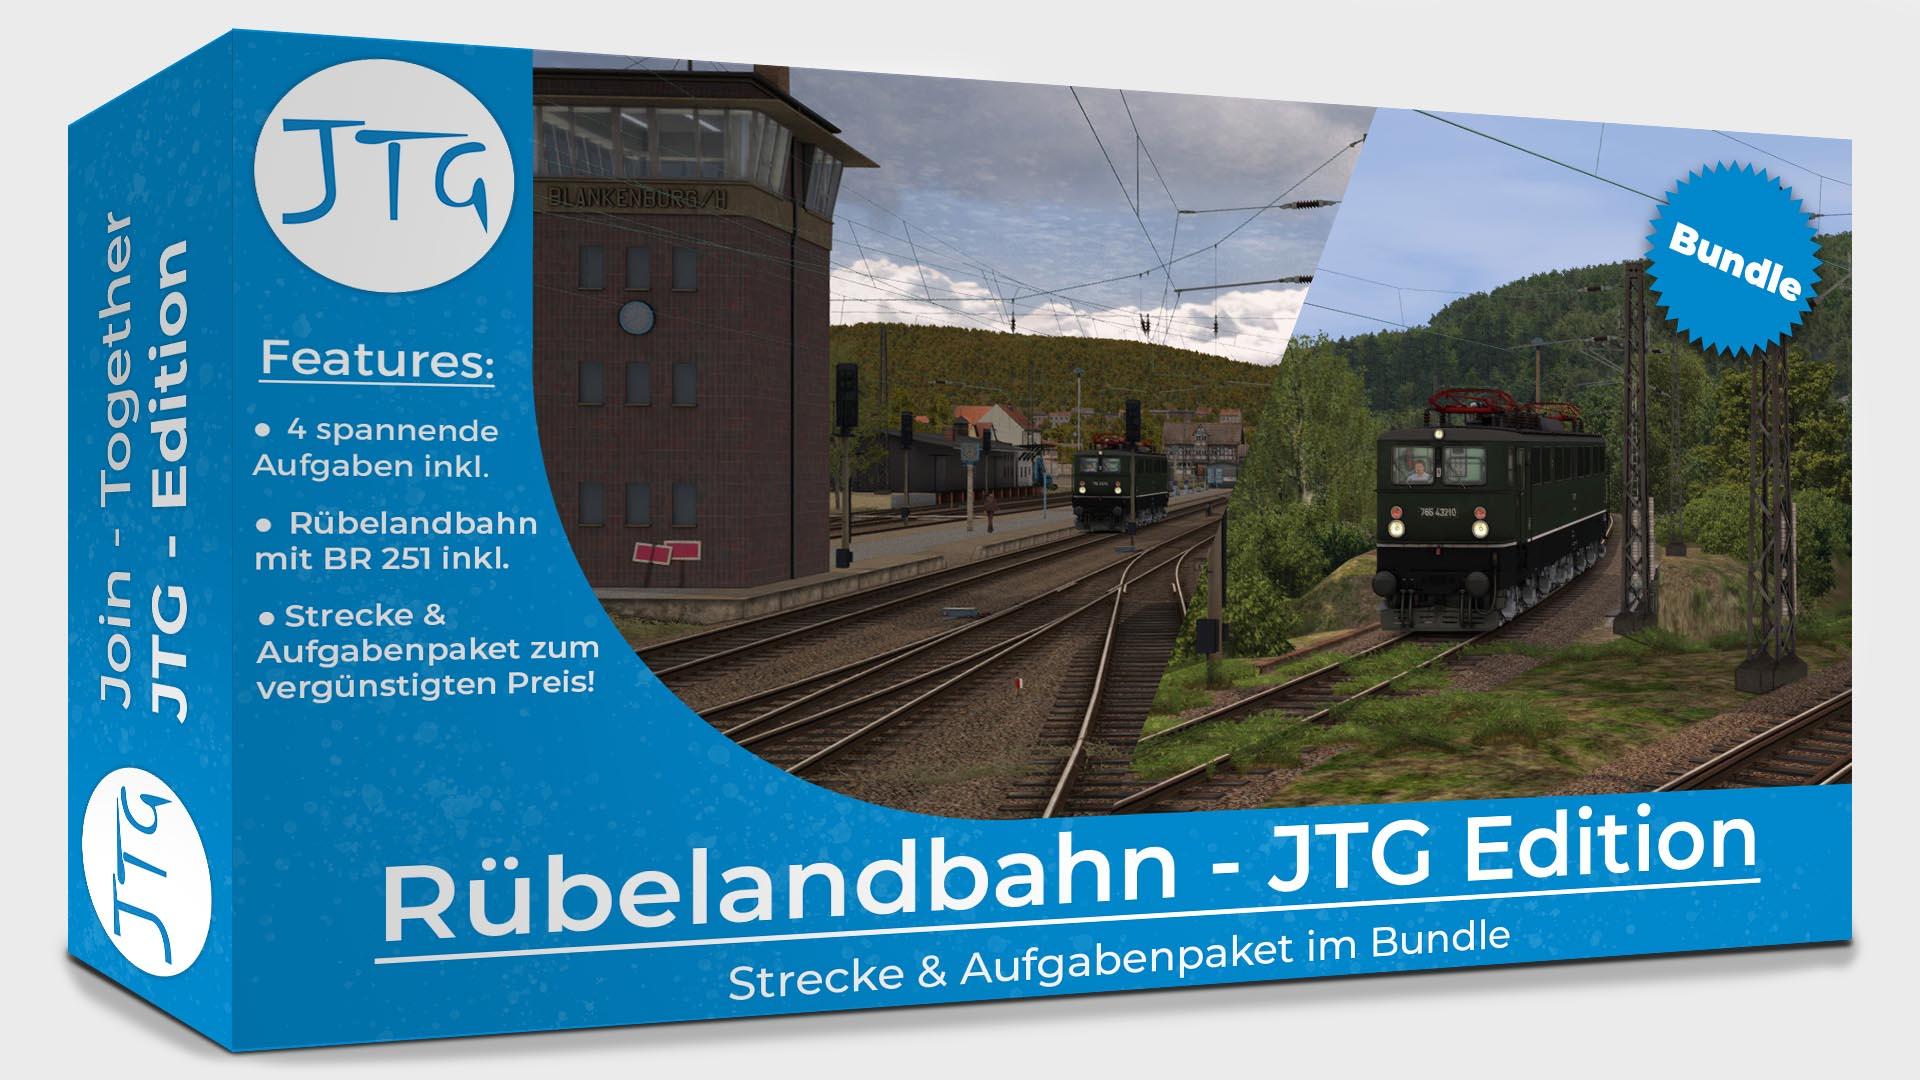 Rübelandbahn - JTG Edition (Pre-Sale)